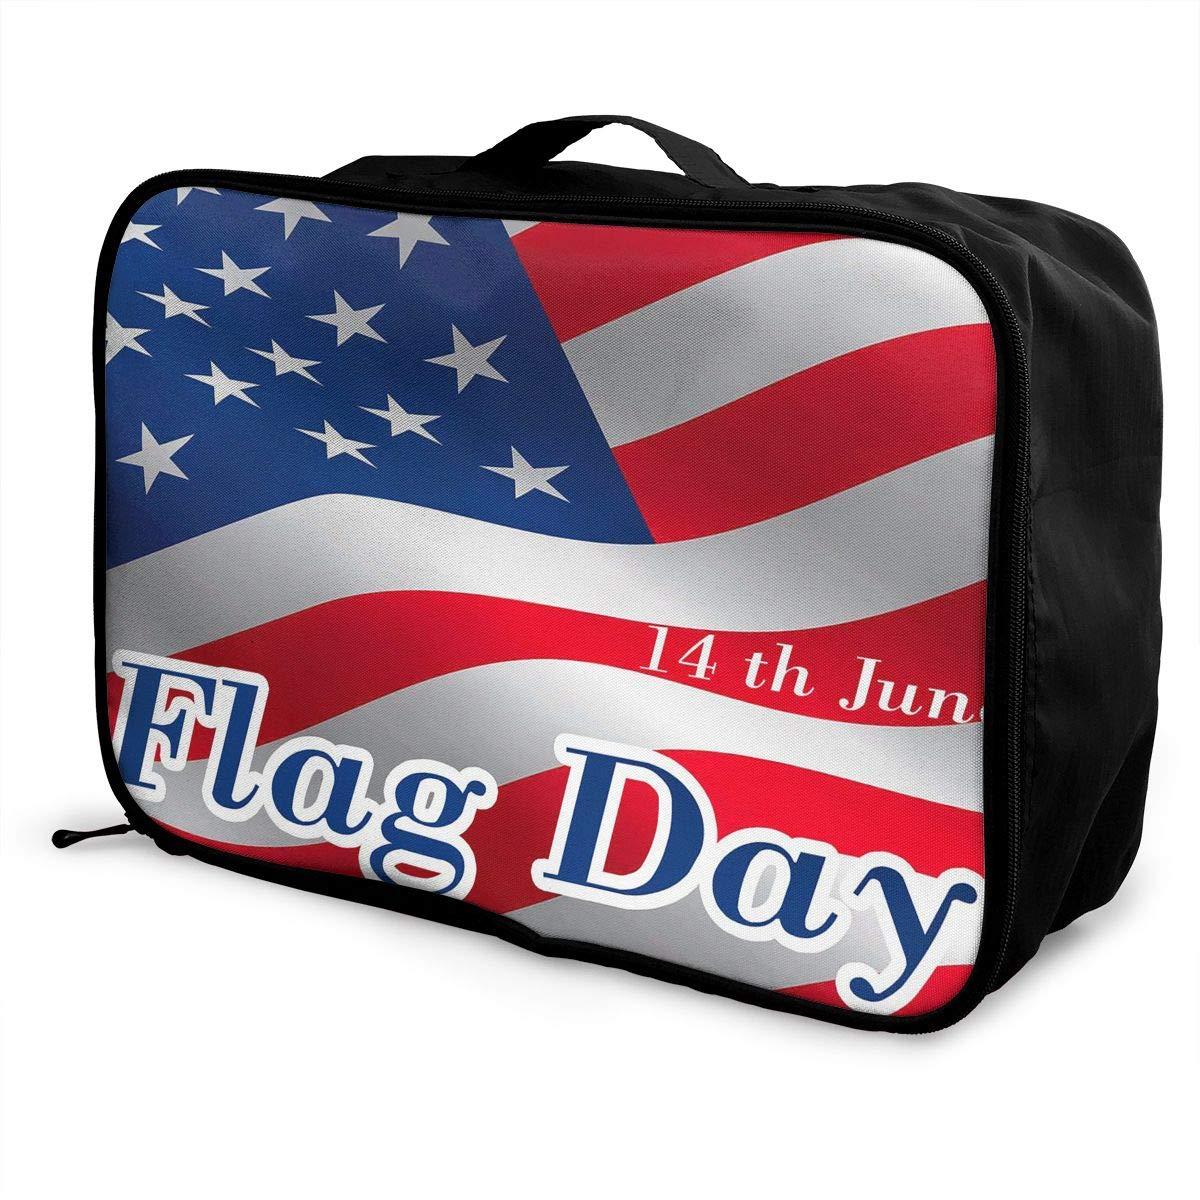 Travel Luggage Duffle Bag Lightweight Portable Handbag Flag Day Large Capacity Waterproof Foldable Storage Tote